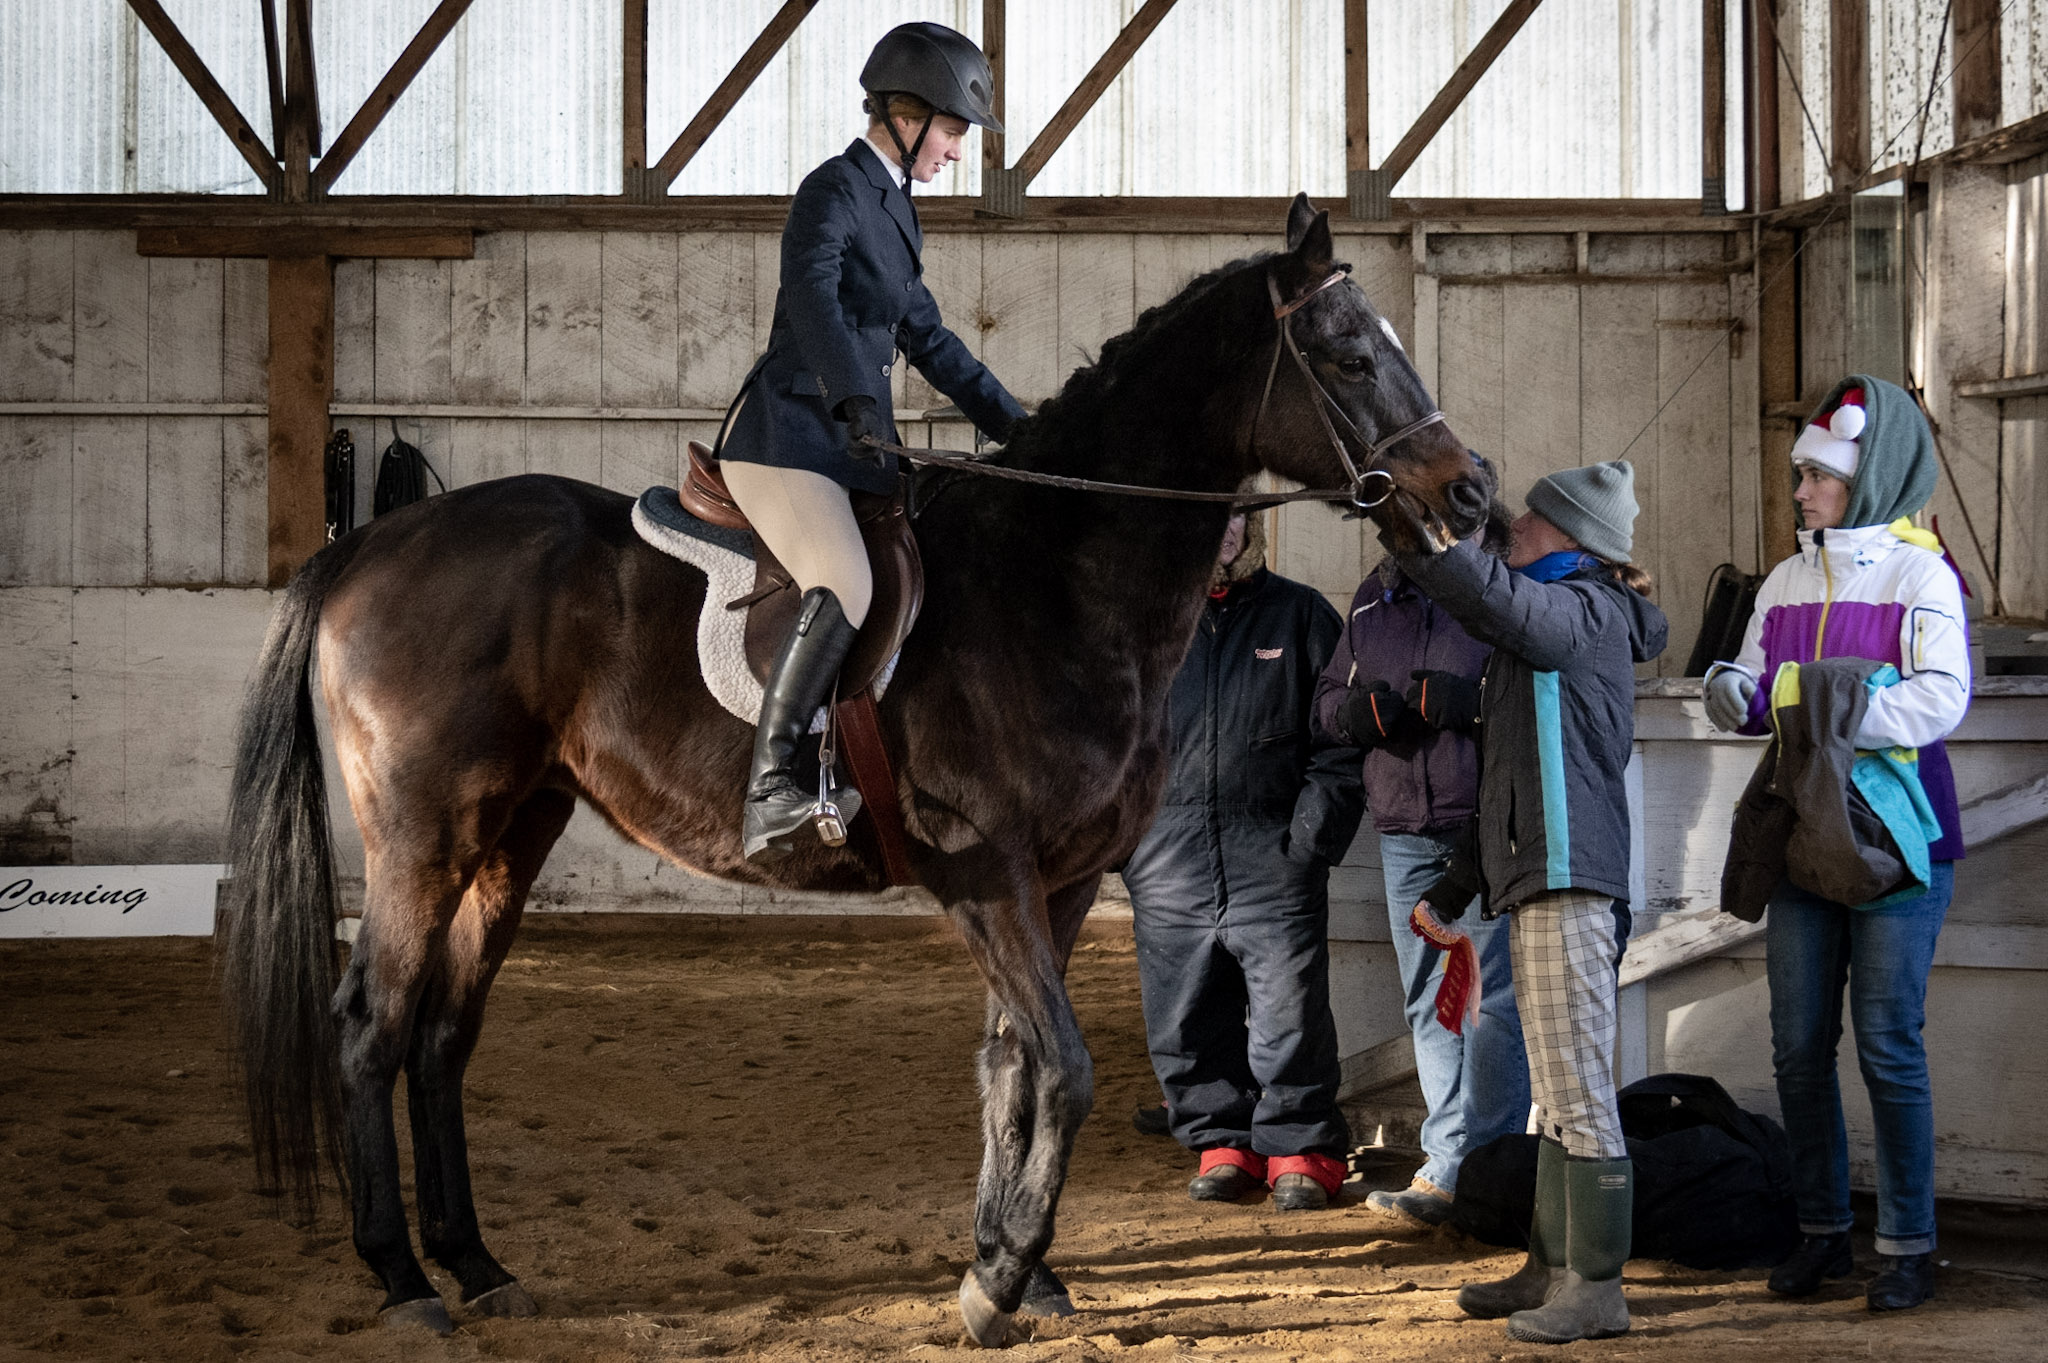 Equestrian Team Recruits For New Season The Bowdoin Orient